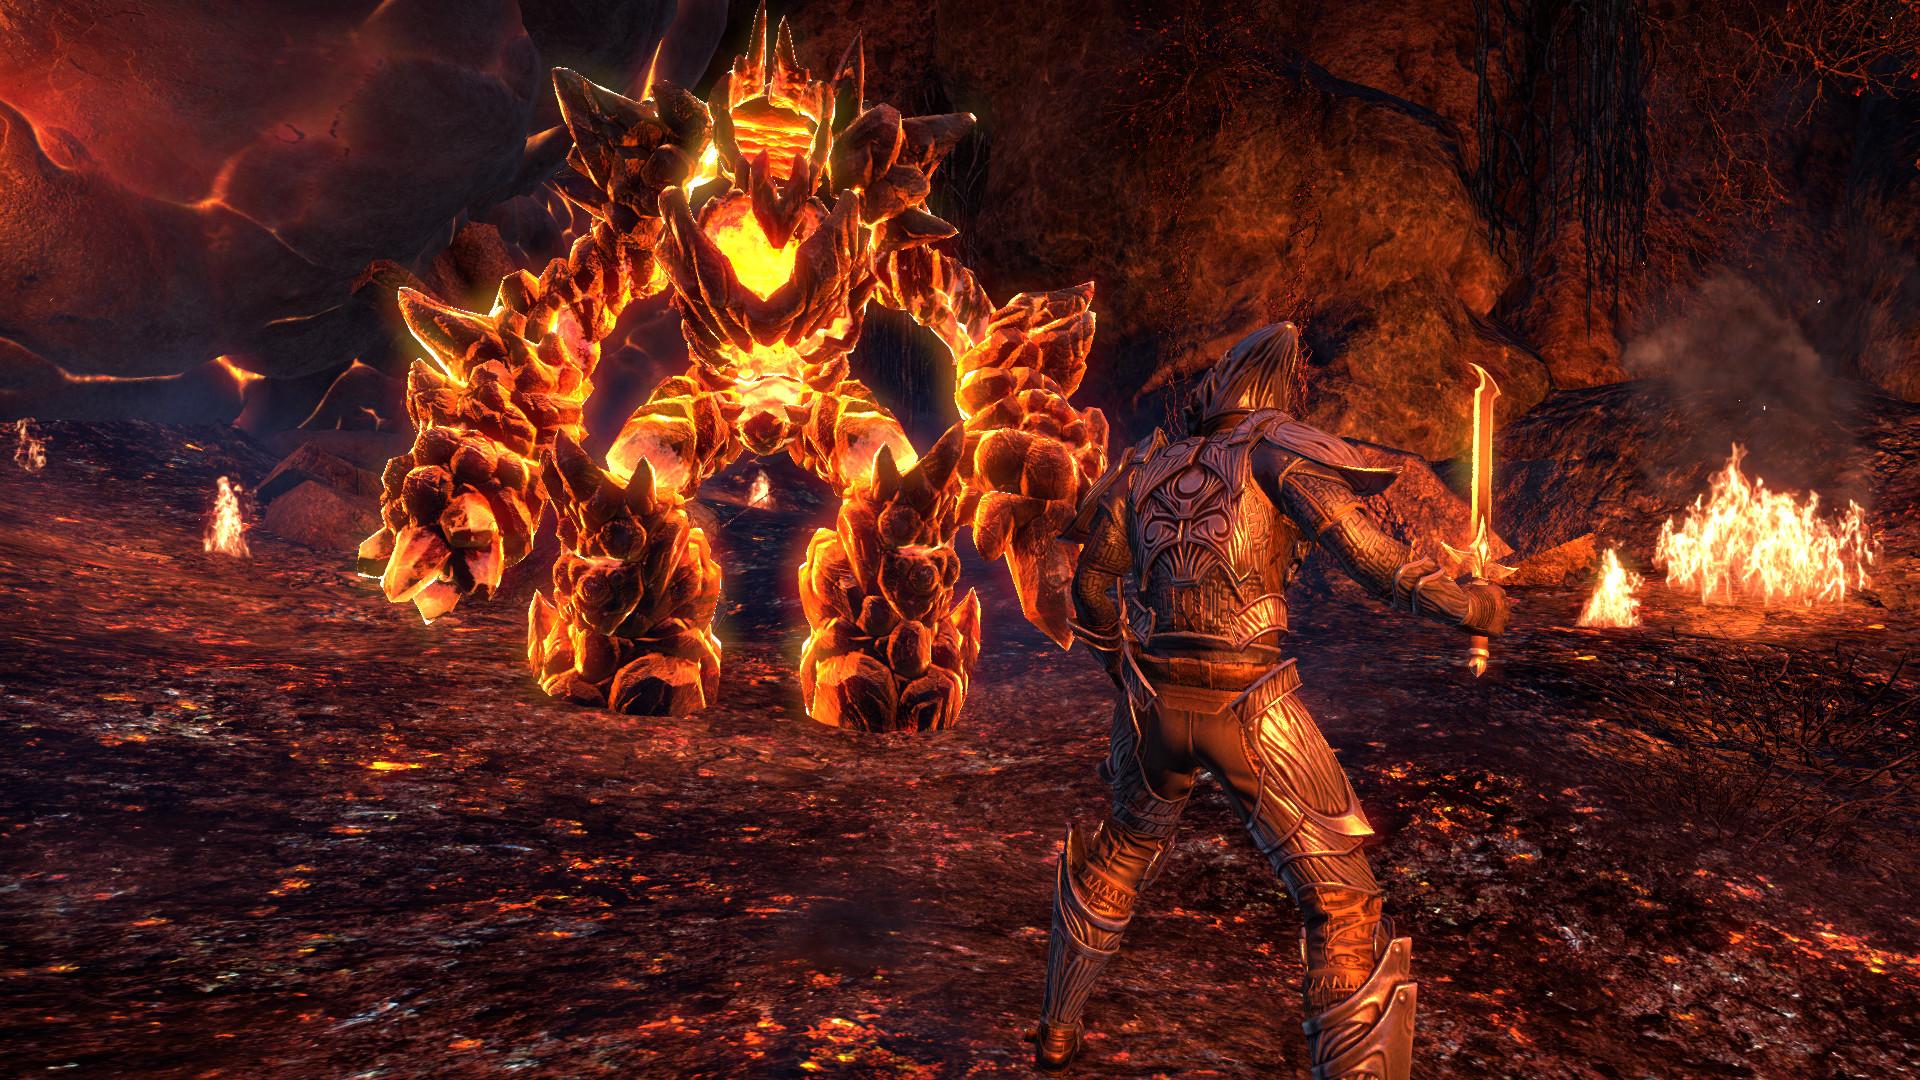 Video Game – The Elder Scrolls Online The Elder Scrolls Online: Morrowind  Wallpaper